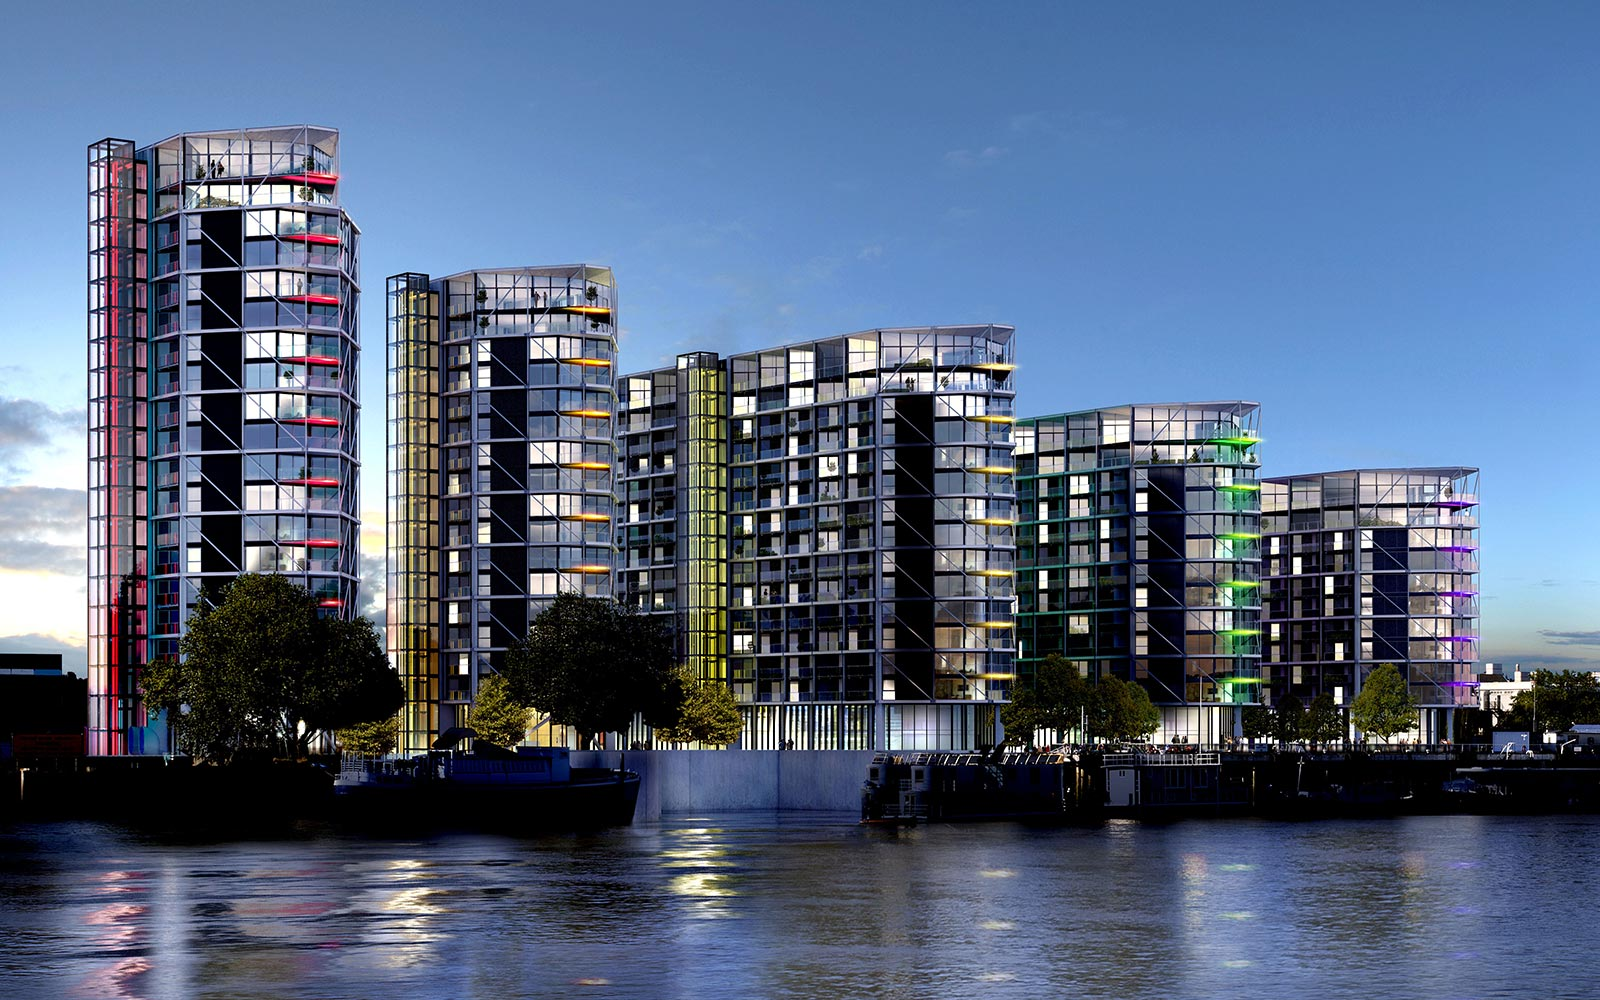 Riverlight london wintech wintech dedicated fa ade for Design consultancy london